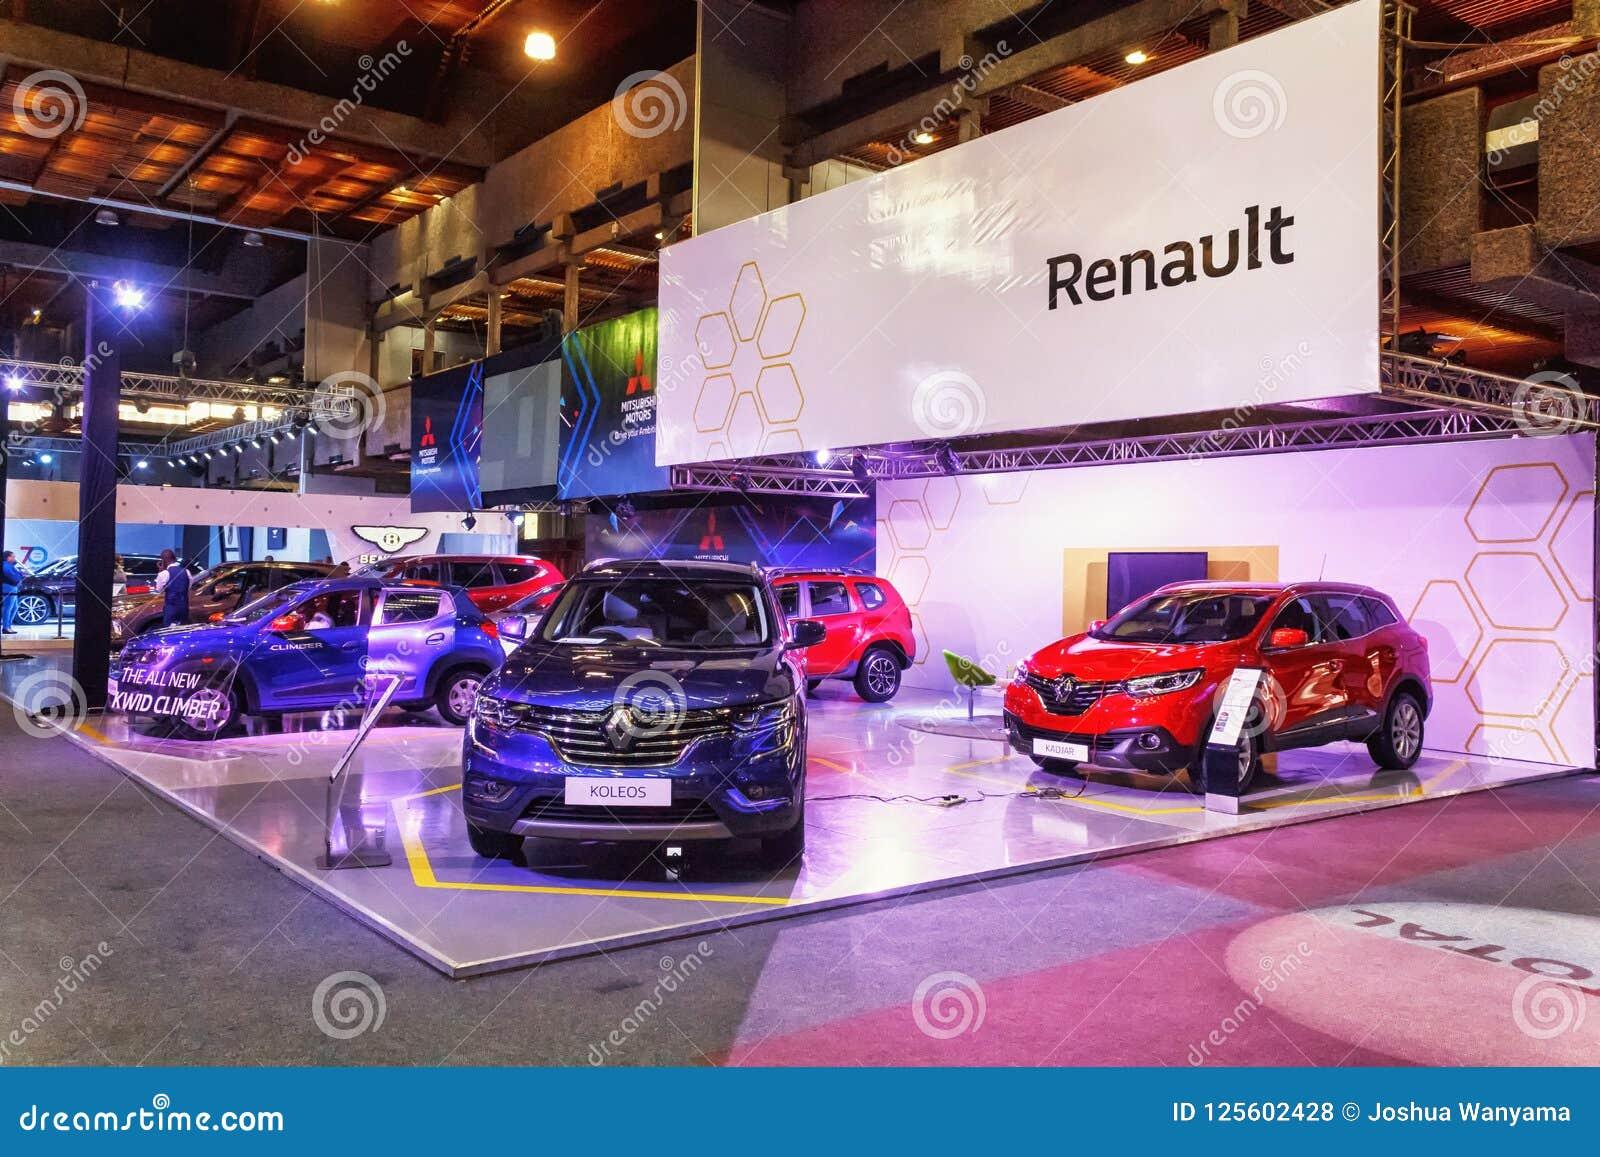 Exhibition Stand Design Kenya : Renault stand editorial stock photo. image of kenya 125602428